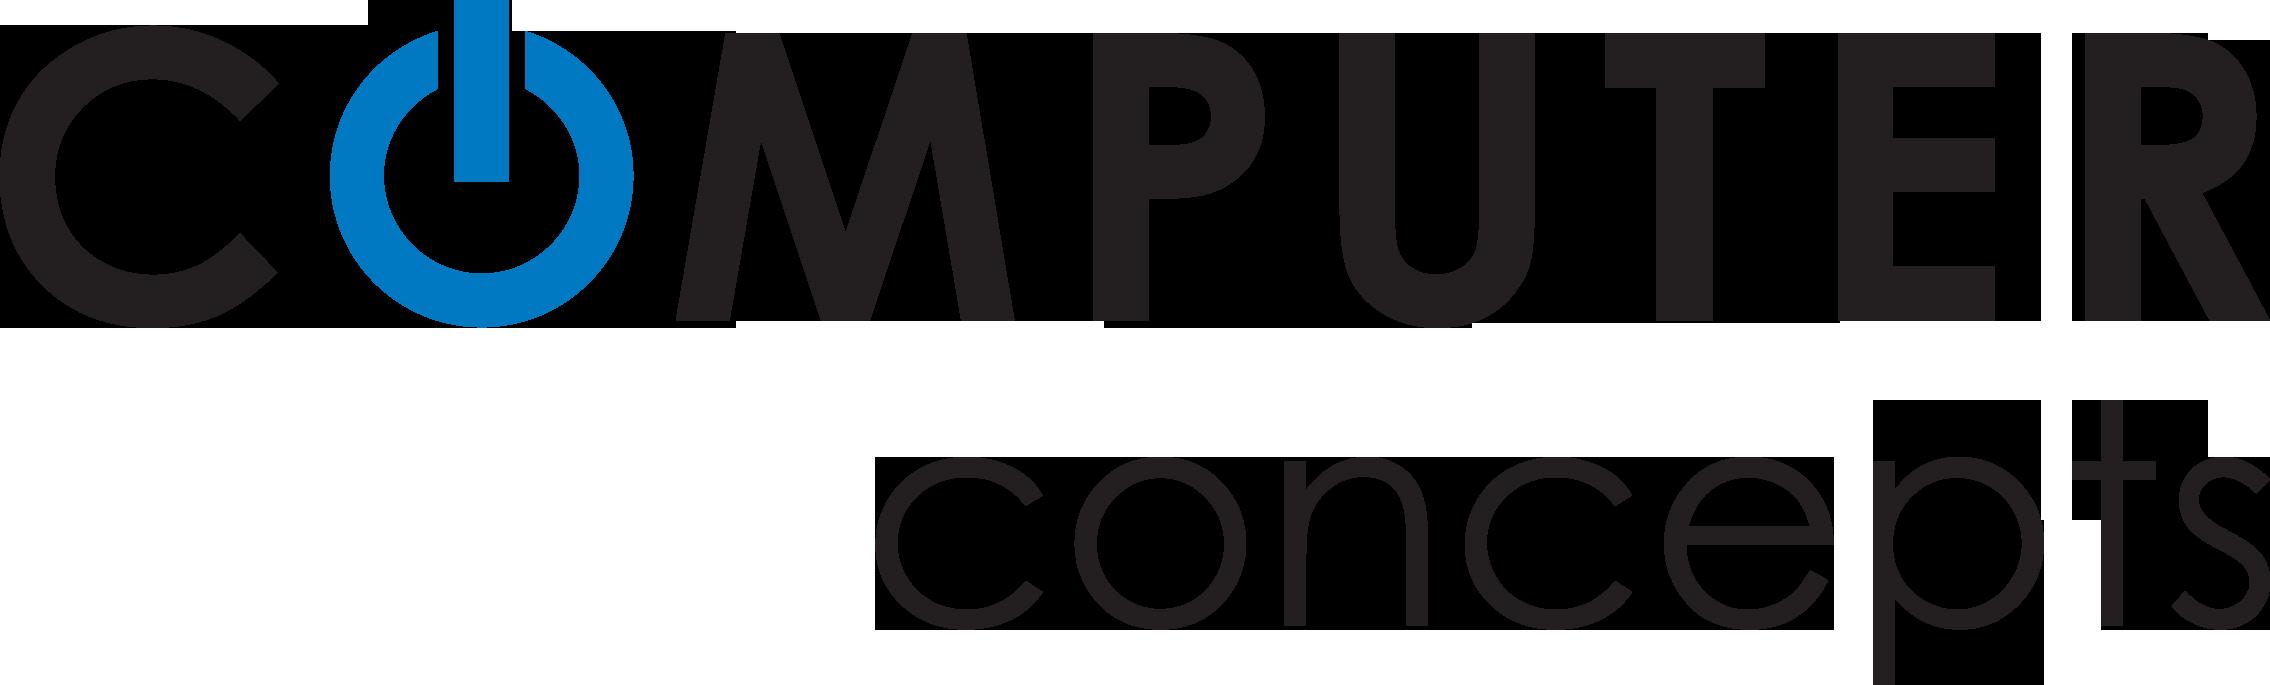 Computer Repair Services From Chesapeake Va To